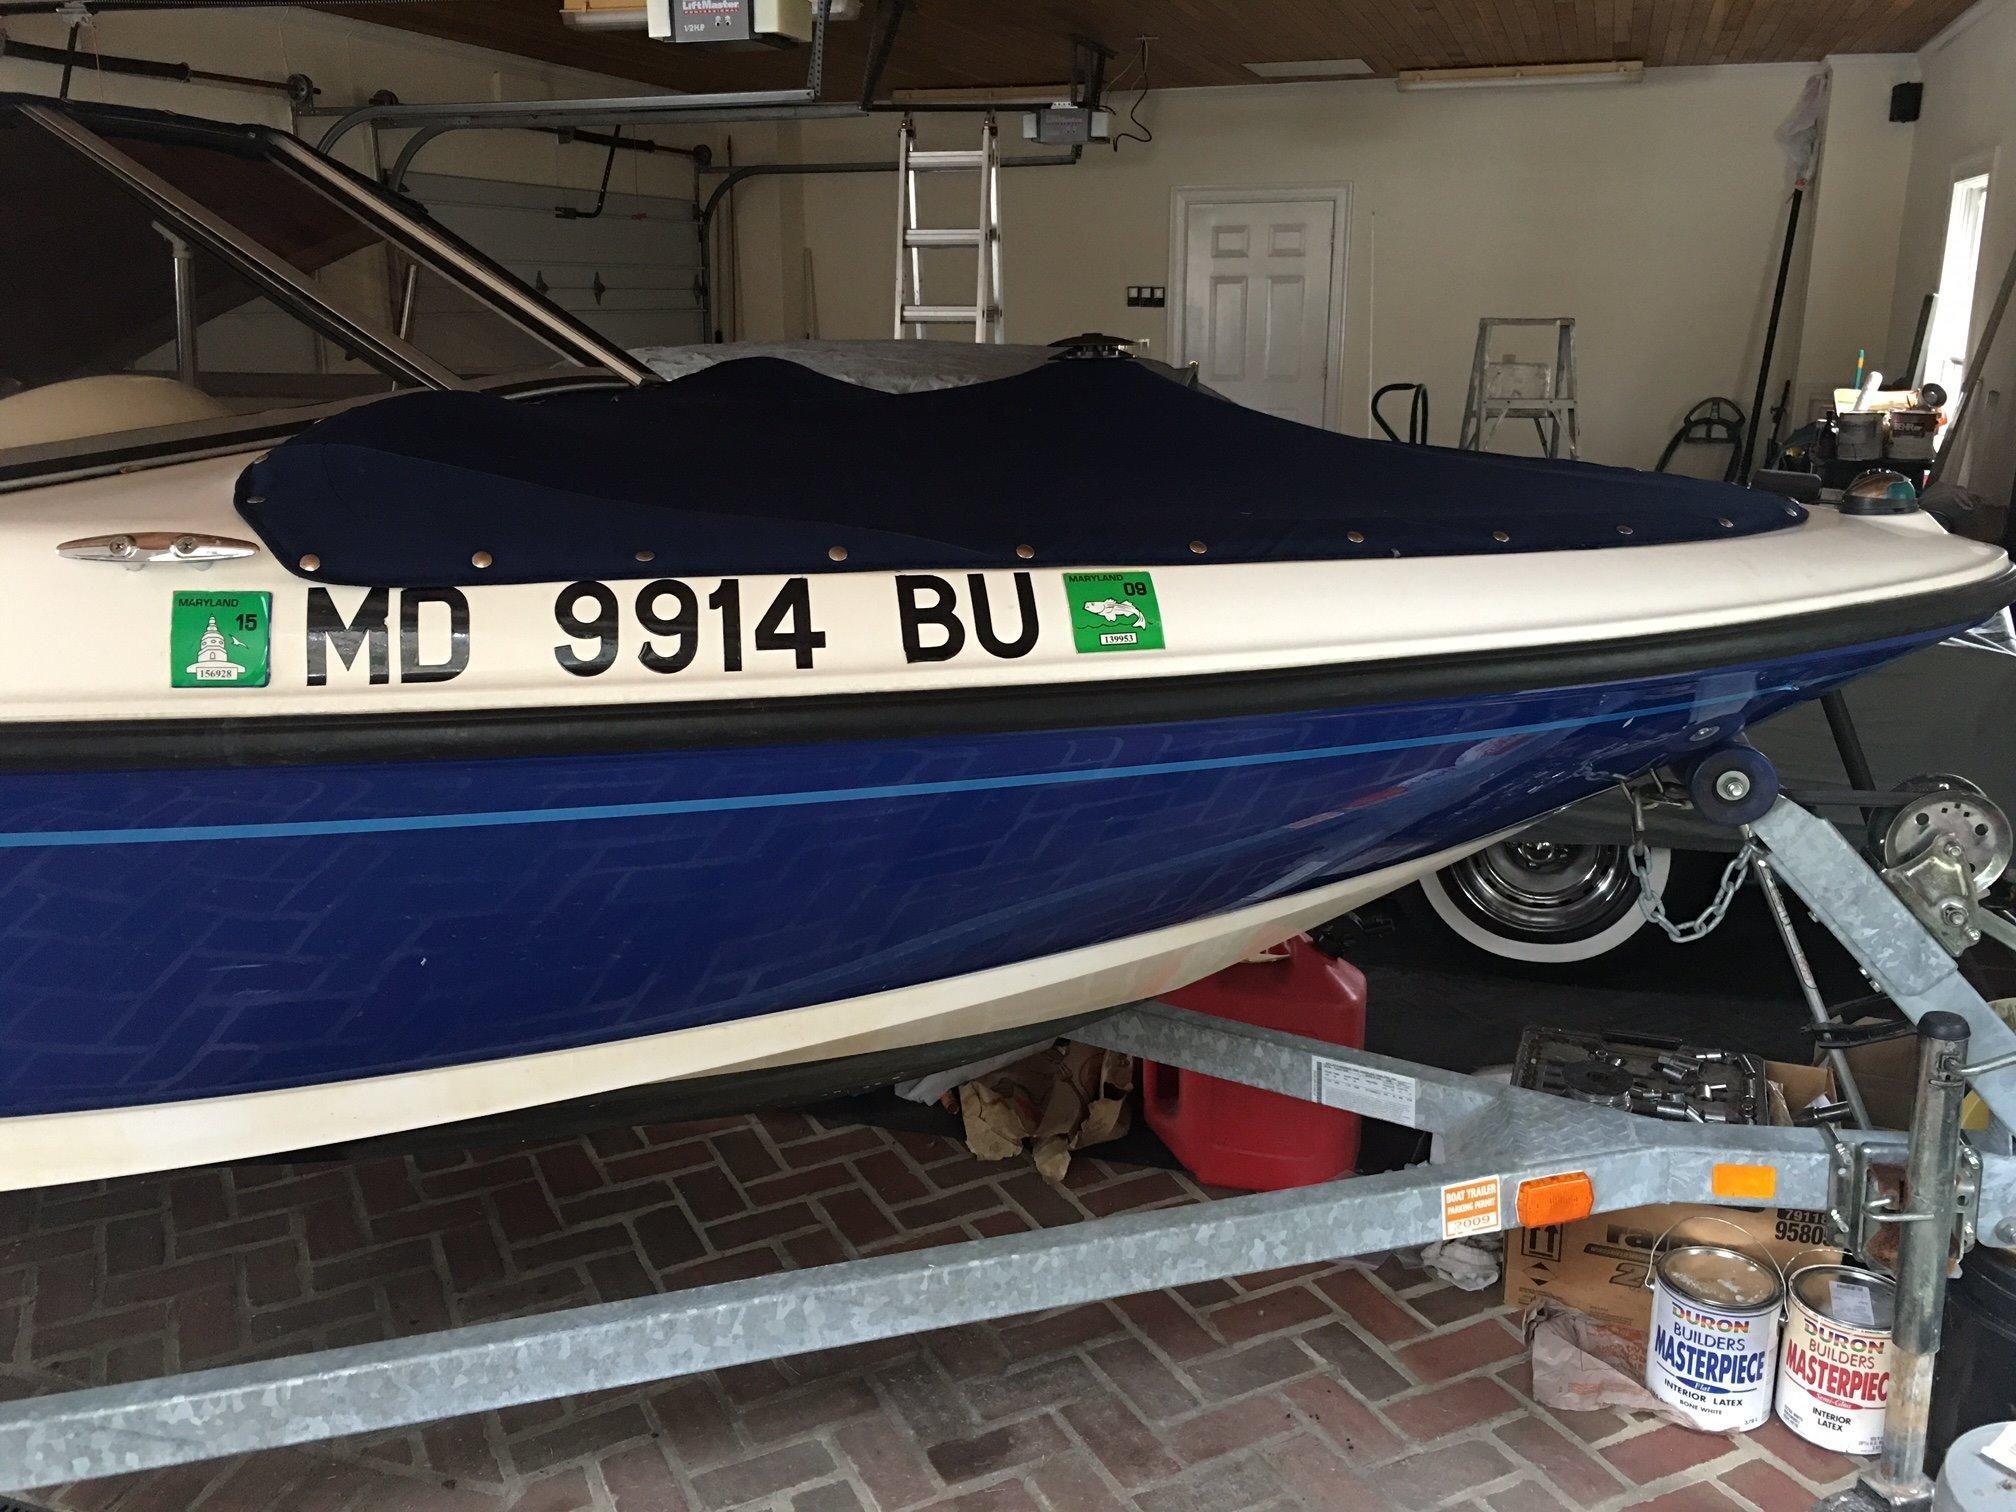 2006 bayliner 175 power boat for sale for Outboard motors for sale maryland